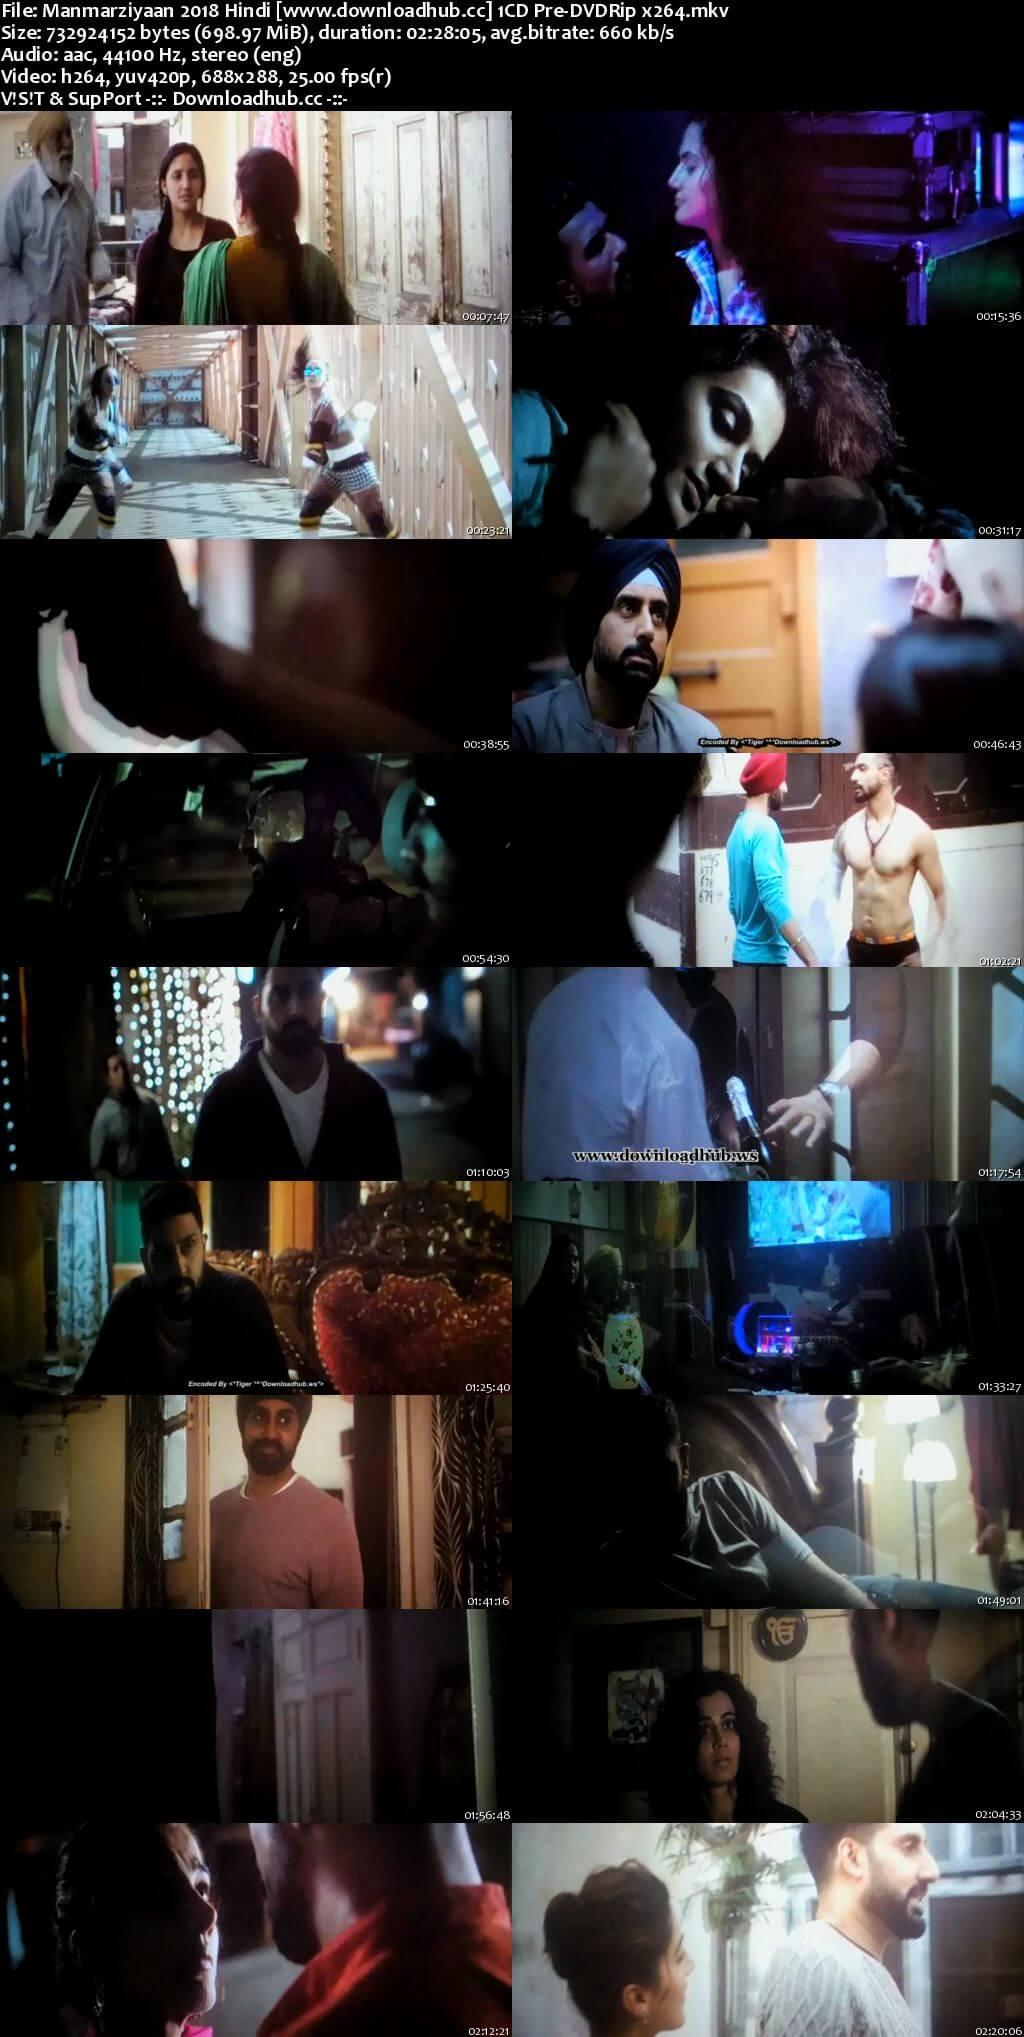 Manmarziyaan 2018 Hindi 700MB Pre-DVDRip x264